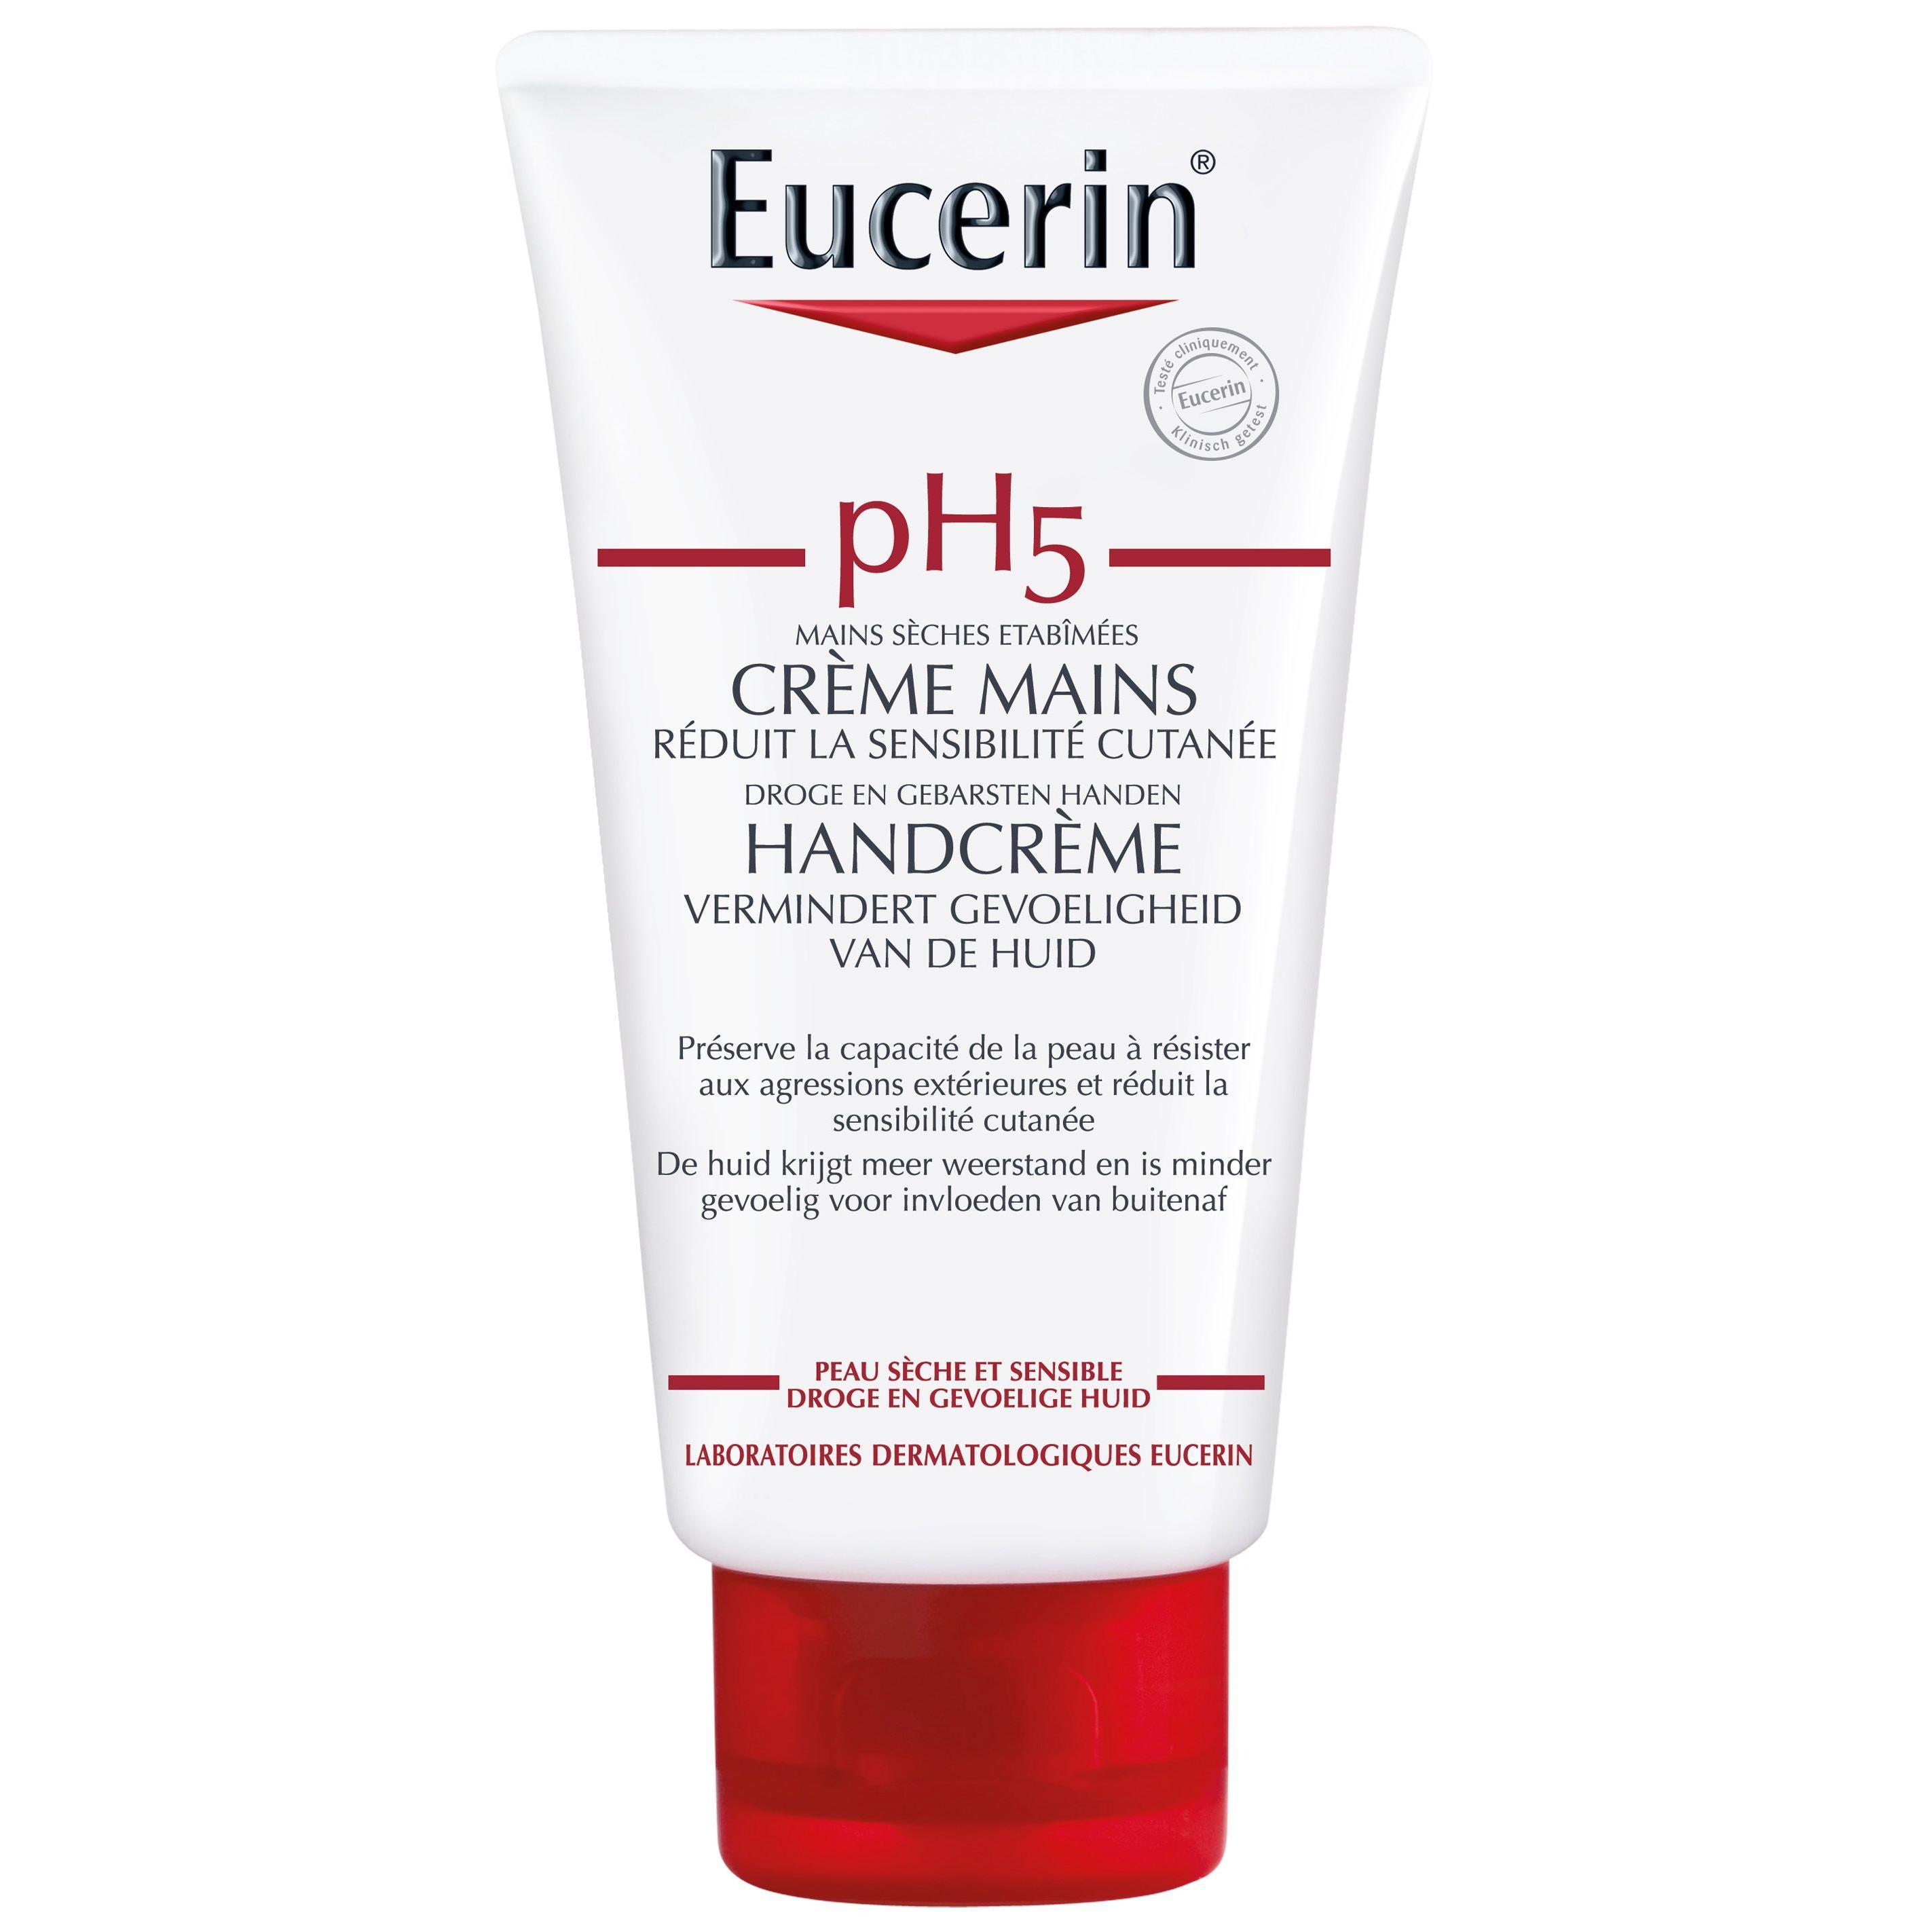 Eucerin Ph5 Handcreme 75 ML